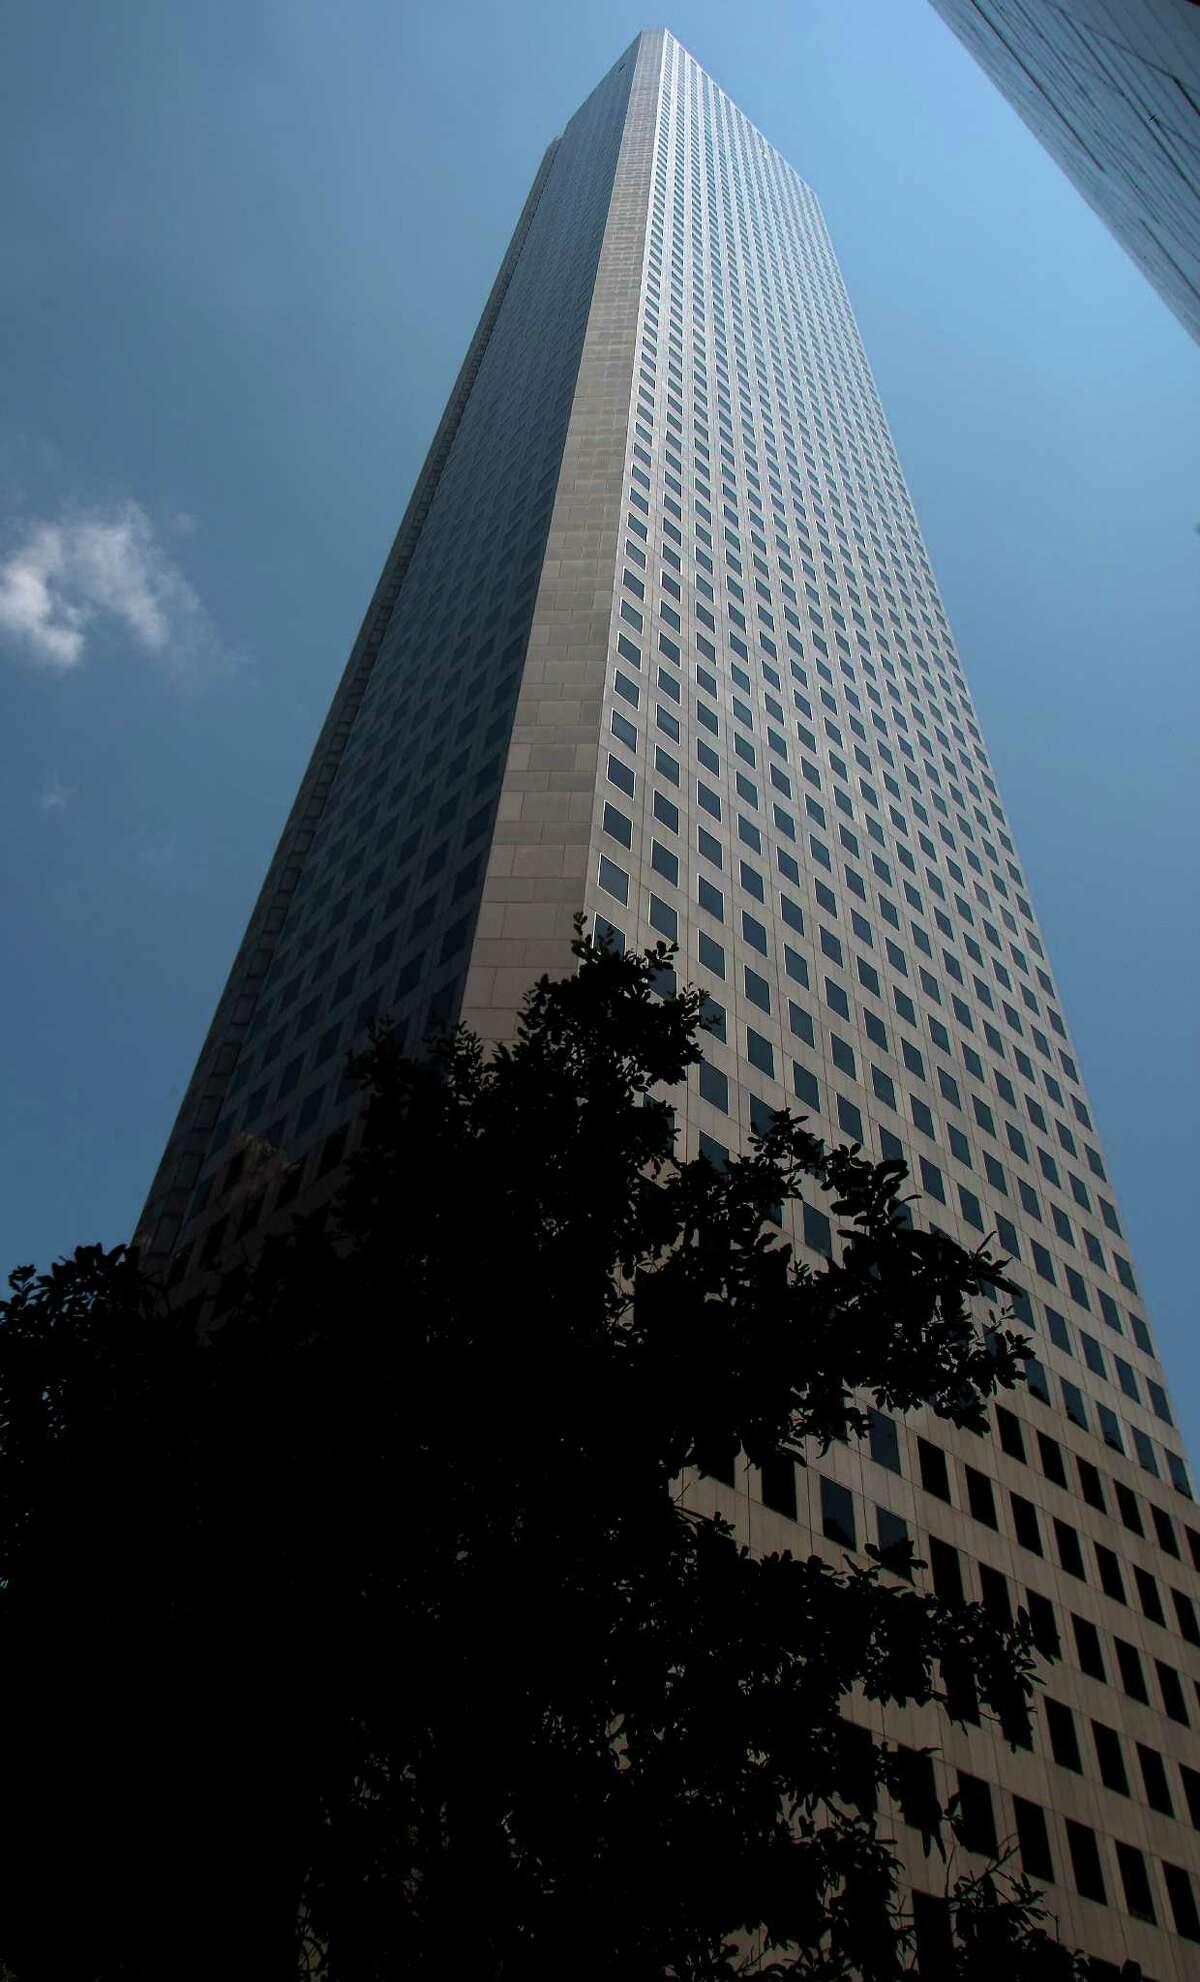 JPMorgan Chase Tower in Houston: 1,002 feet, 75 stories